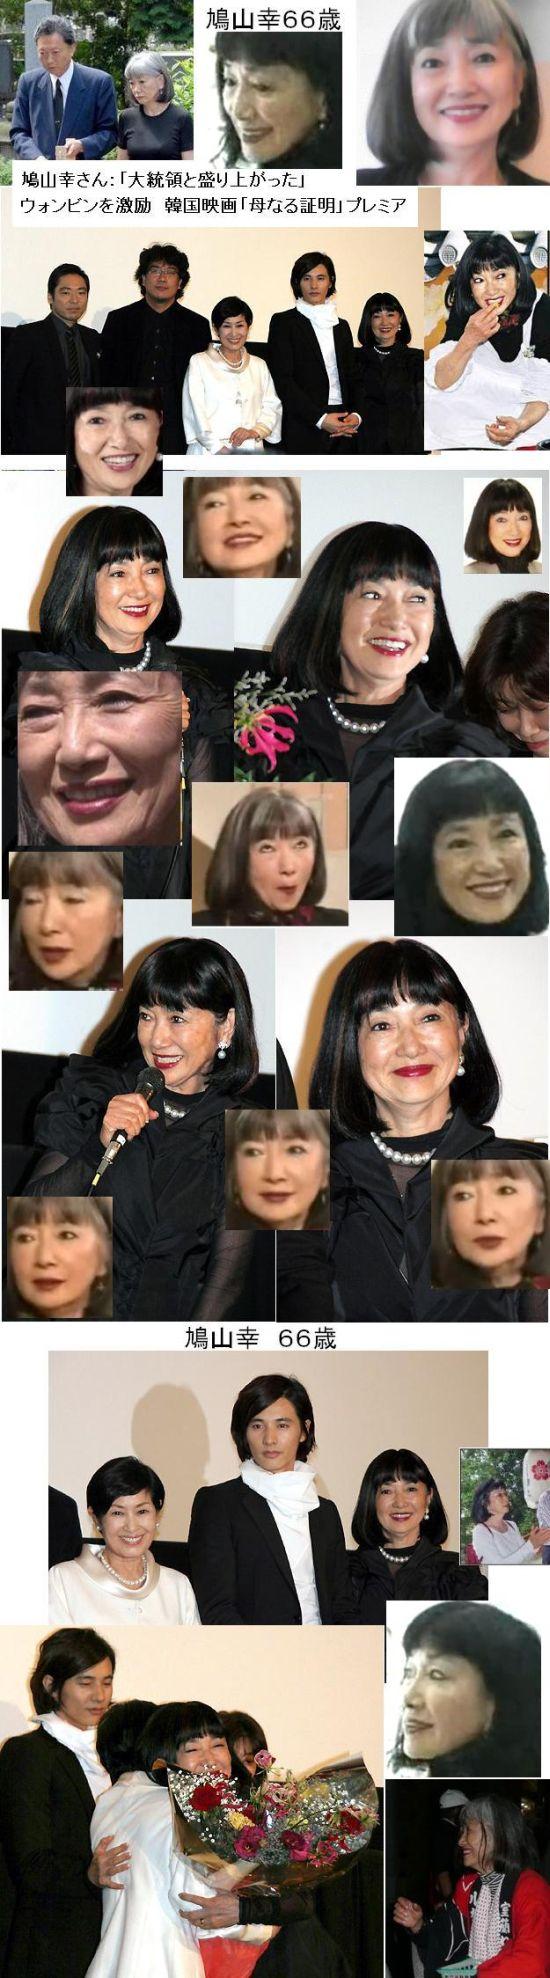 miyukihatoyama66sai.jpg